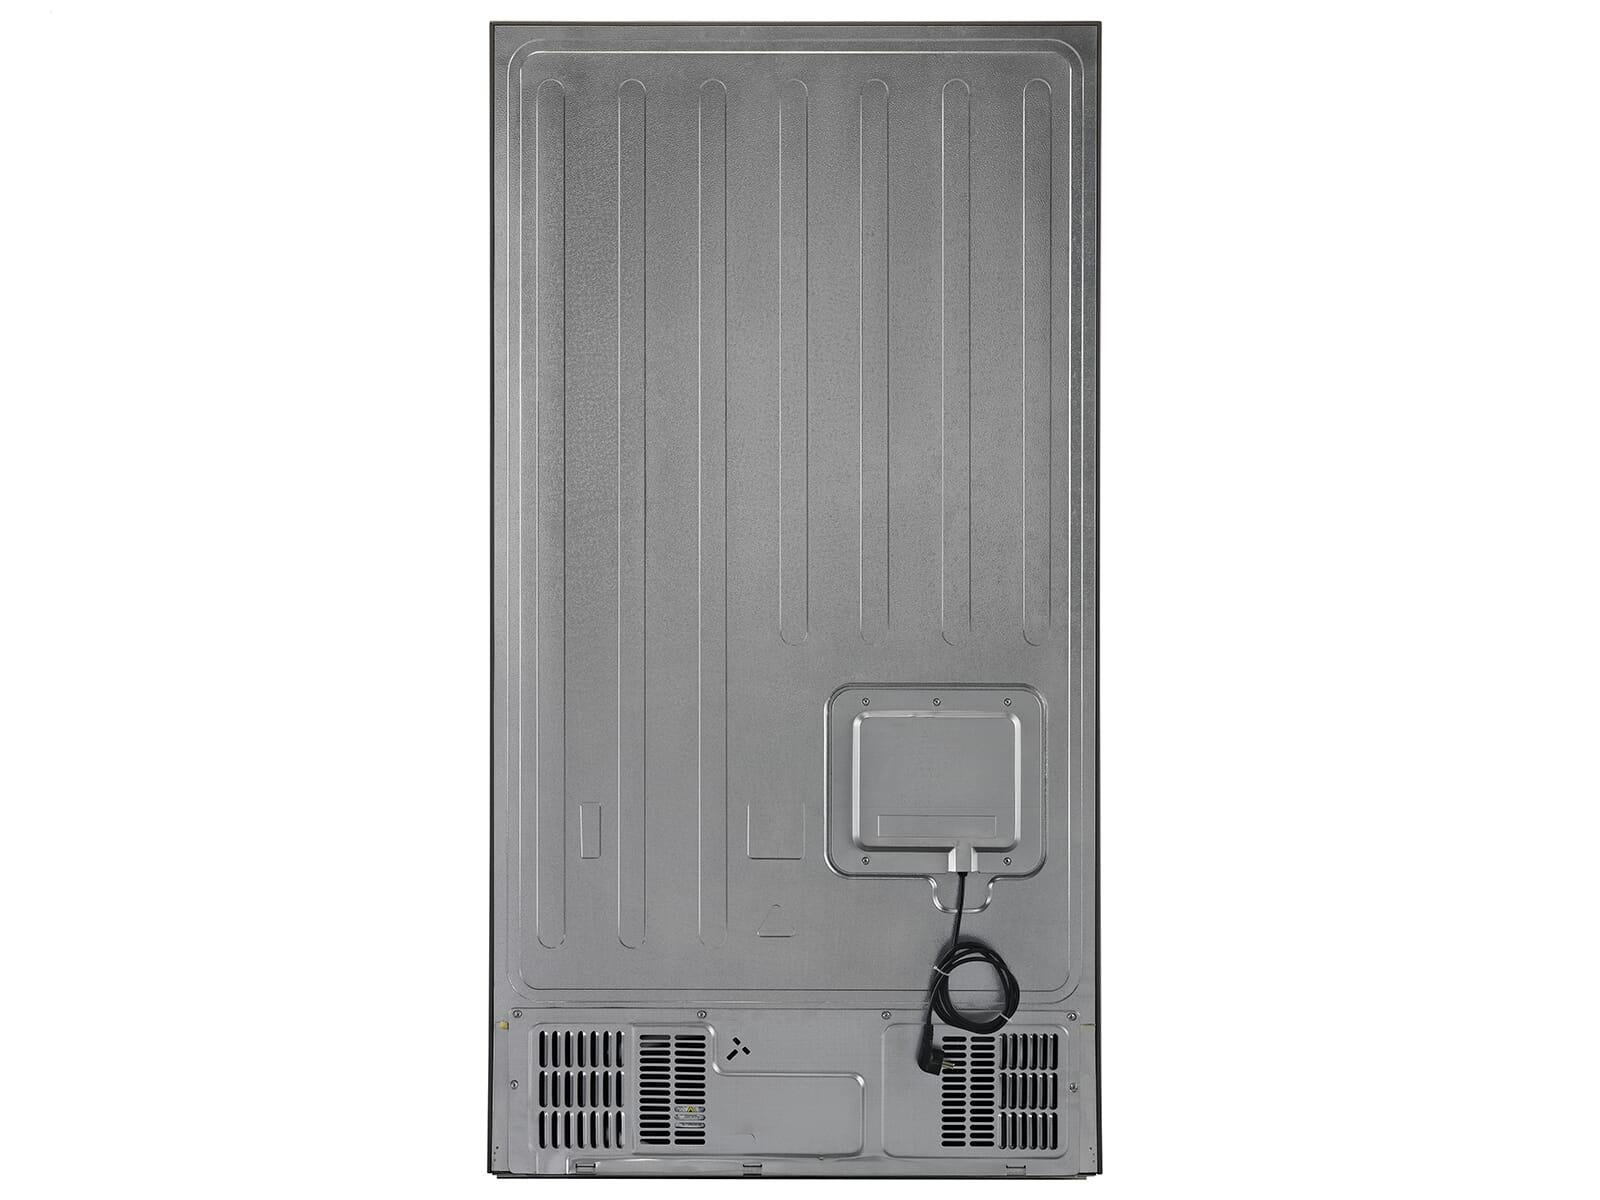 Aeg Kühlschrank French Door : Aeg rmb86321nx french door kühl gefrierkombination edelstahl